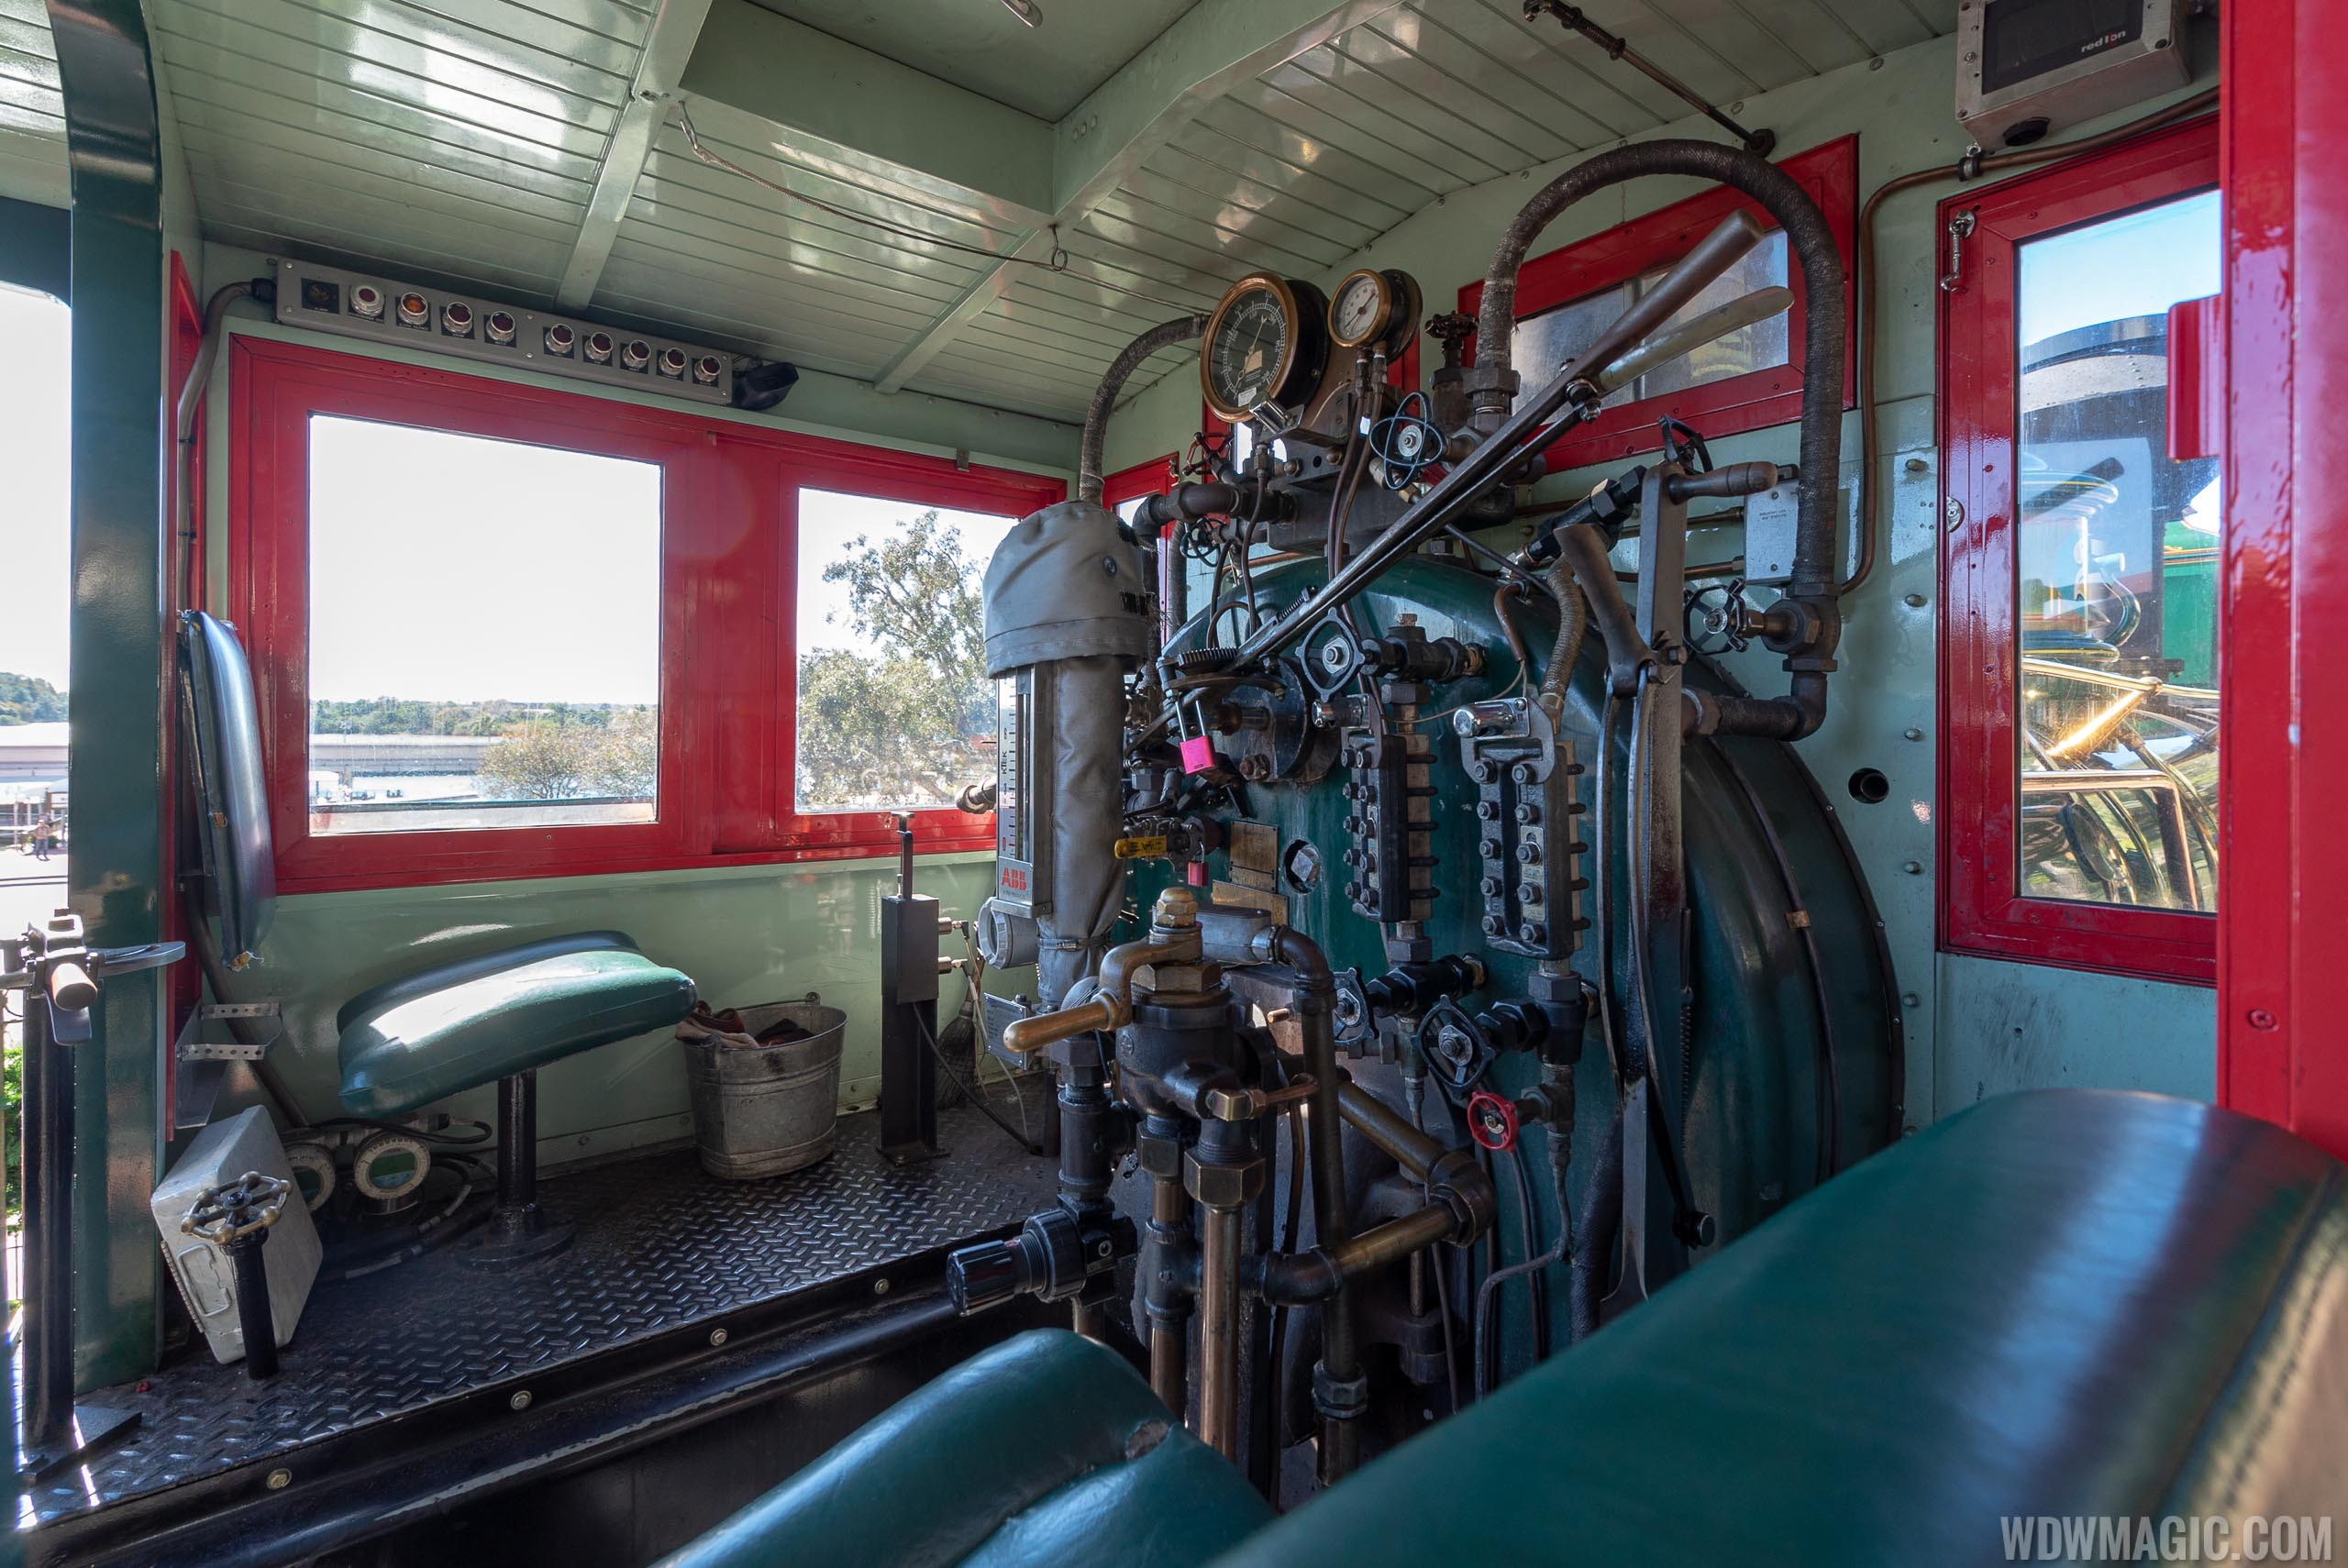 Walt Disney World Railway static exhibit